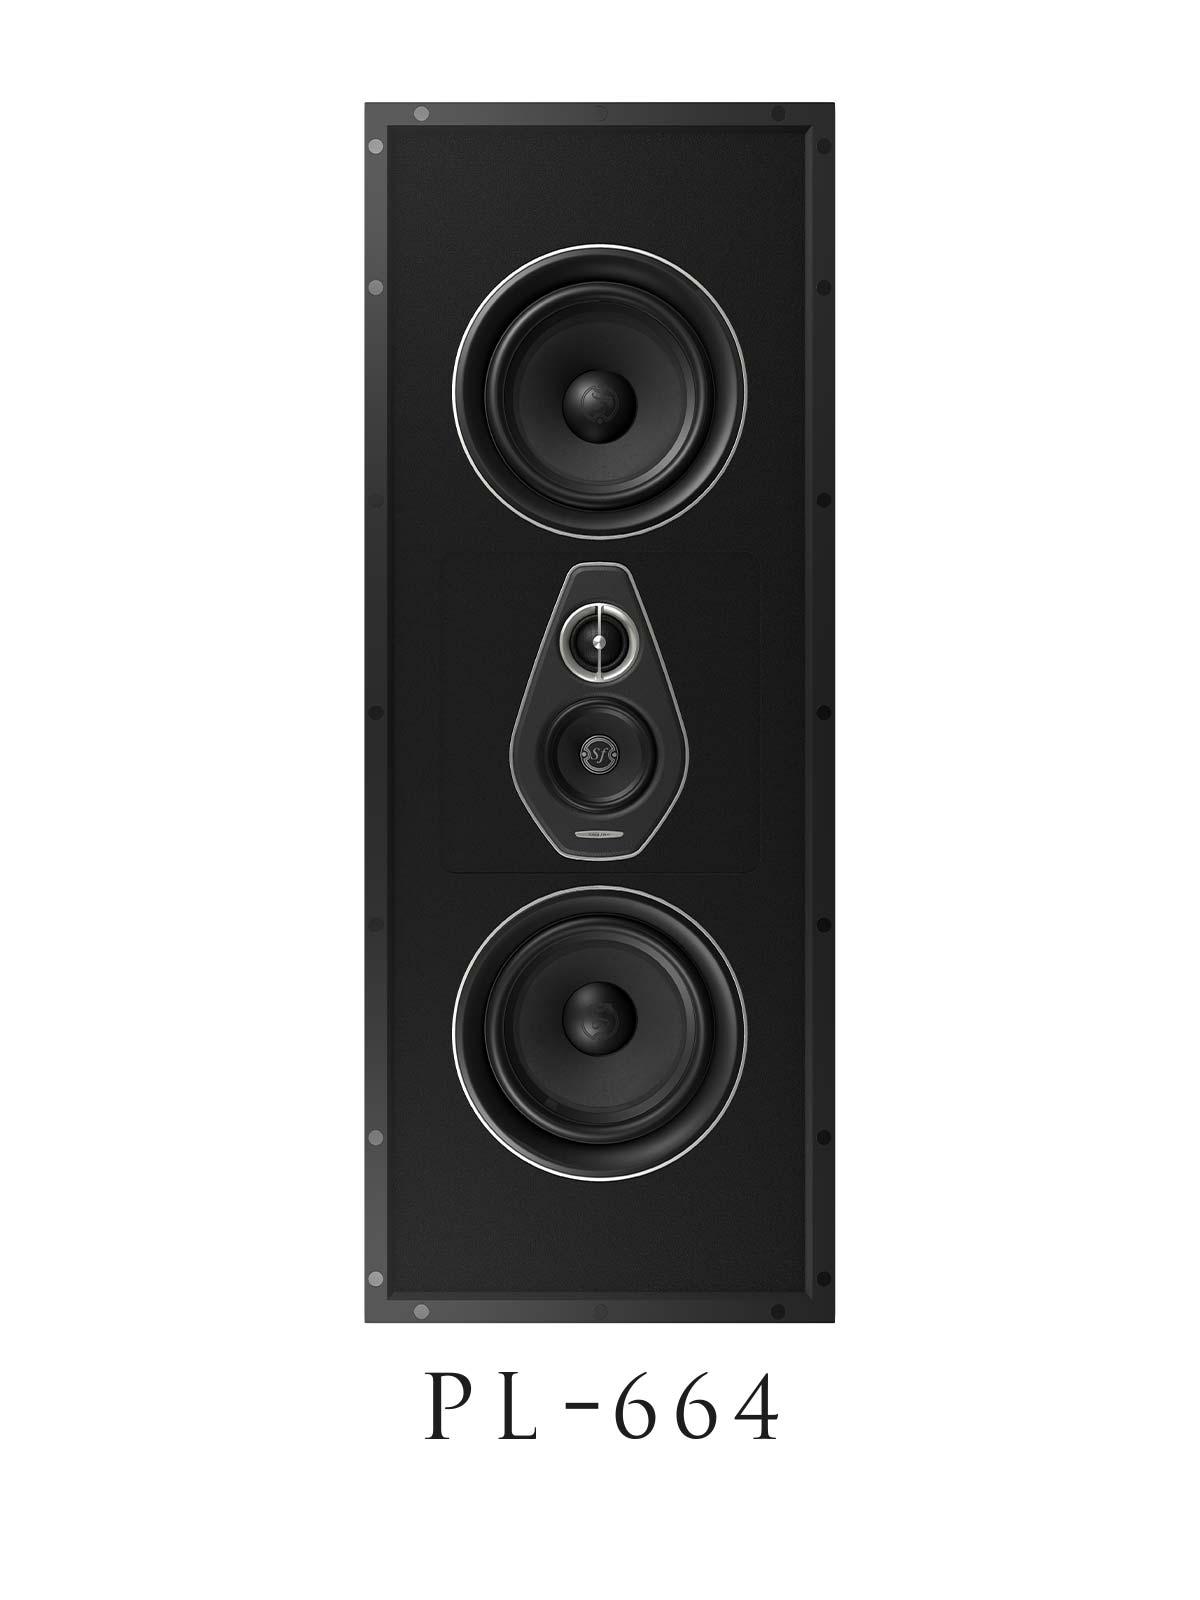 Palladio PL-664